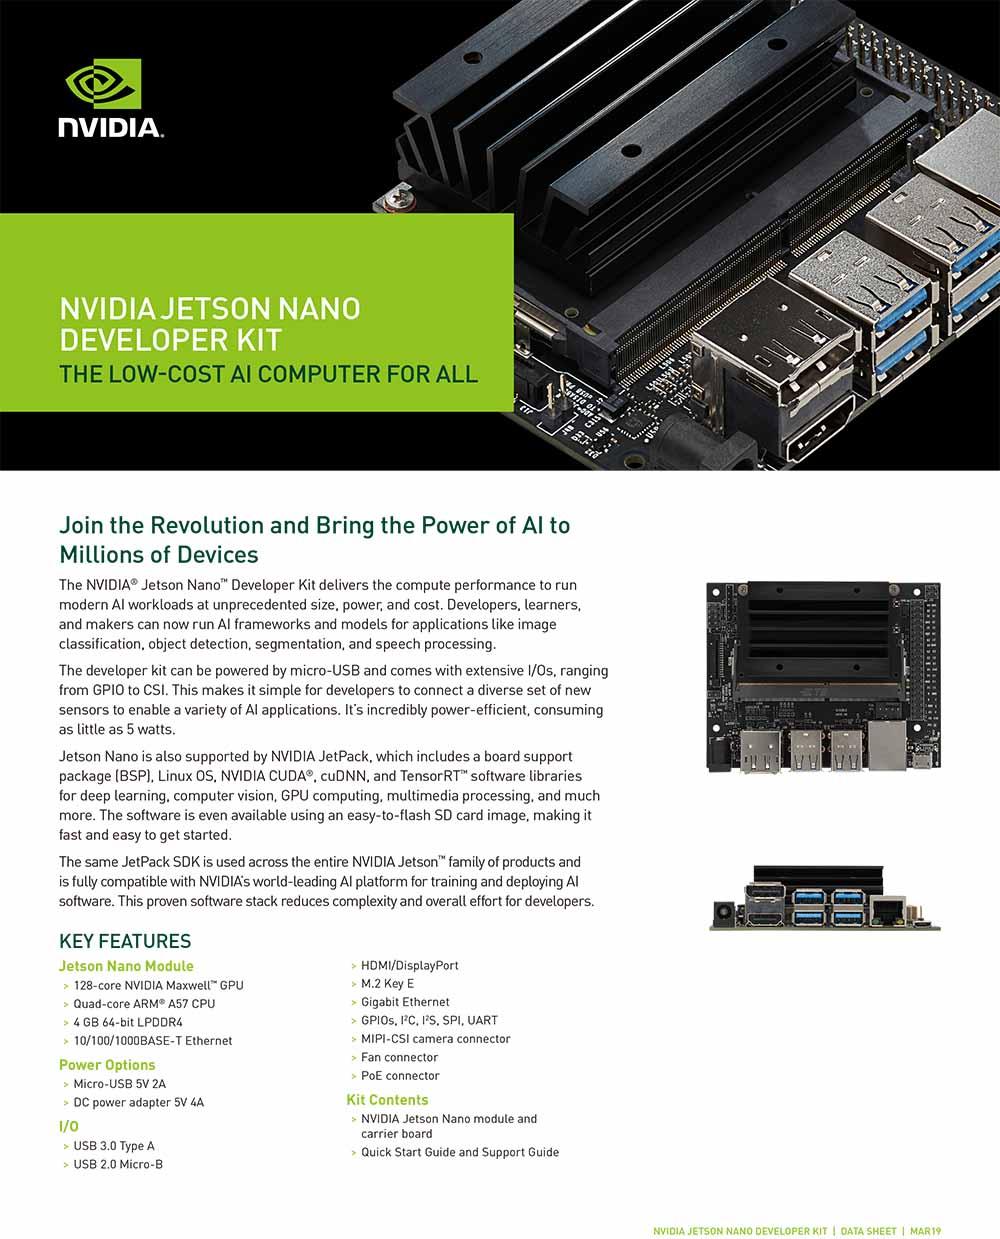 NVIDIA Jetson Nano Kit de desarrollo para inteligencia Artiticial aprendizaje profundo AI Computing, soporte PyTorch, TensorFlow y Caffe - 6